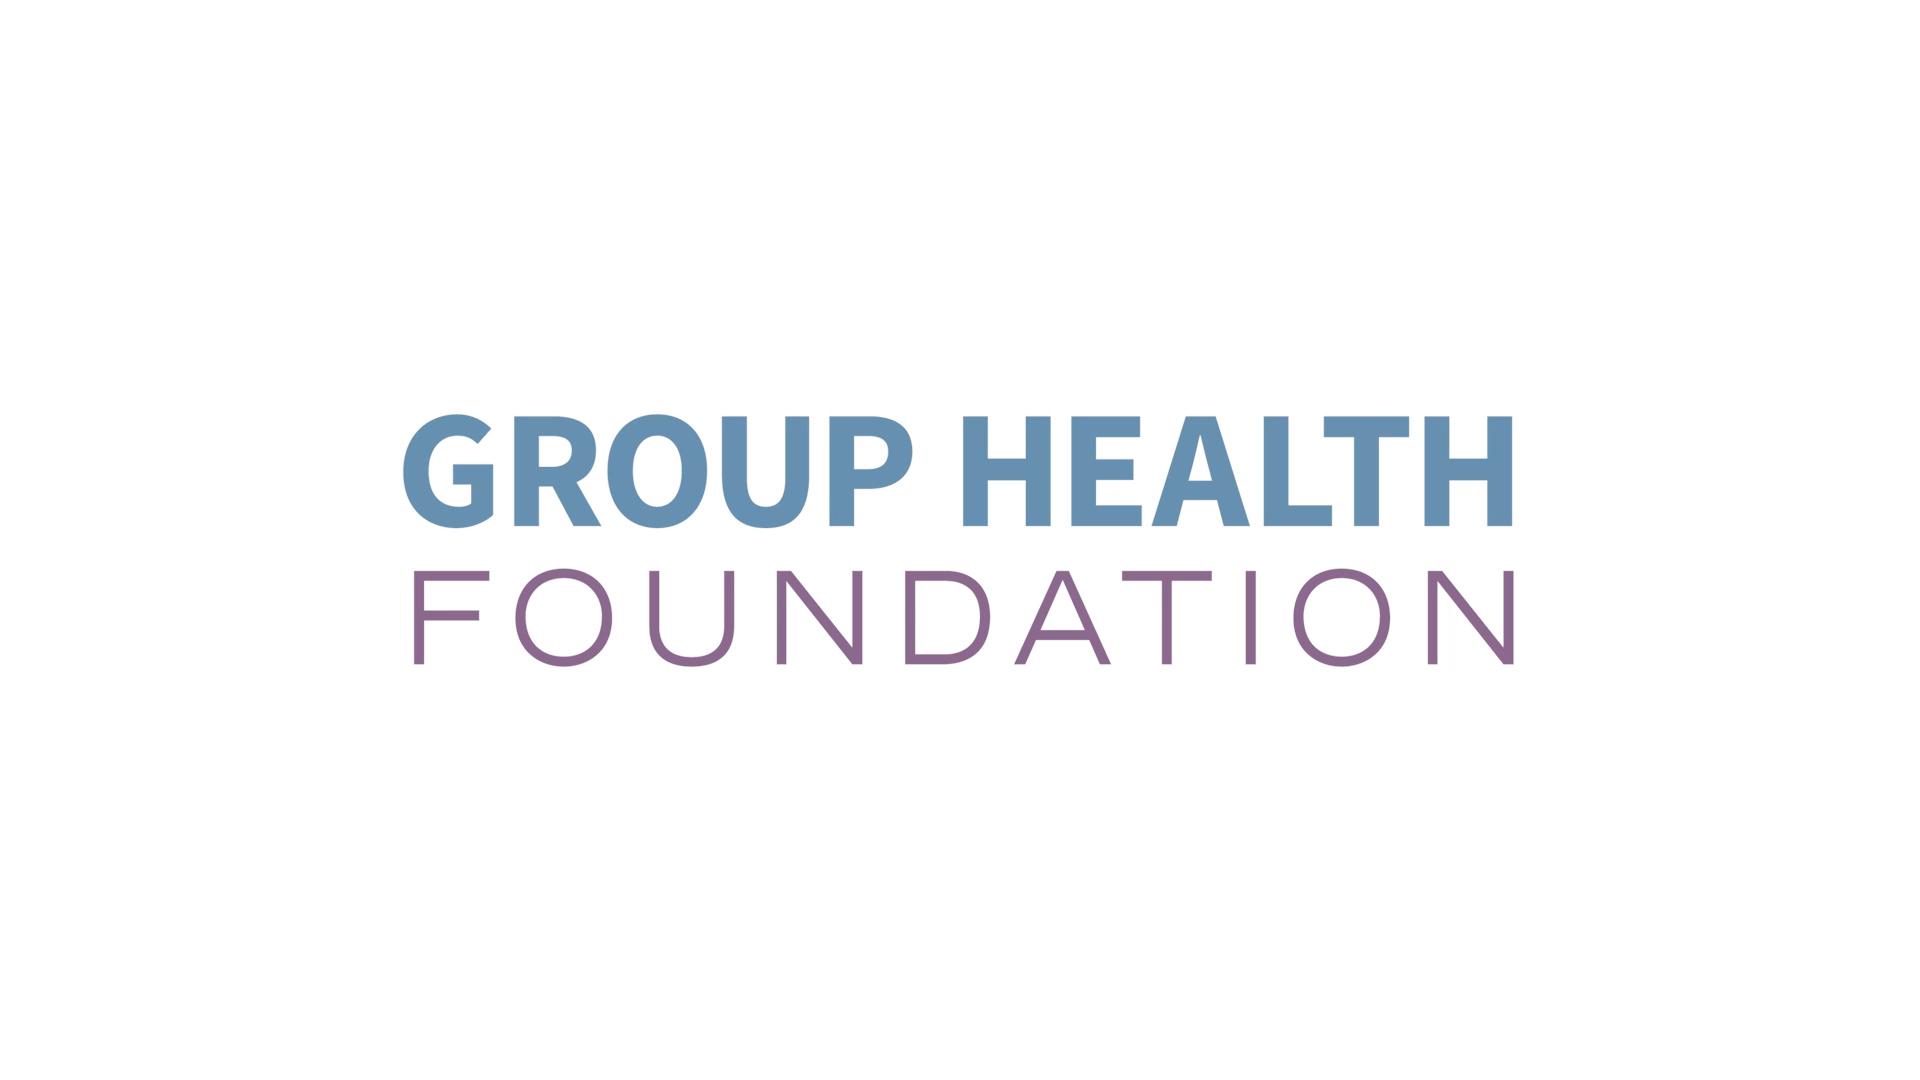 Group Health Foundation